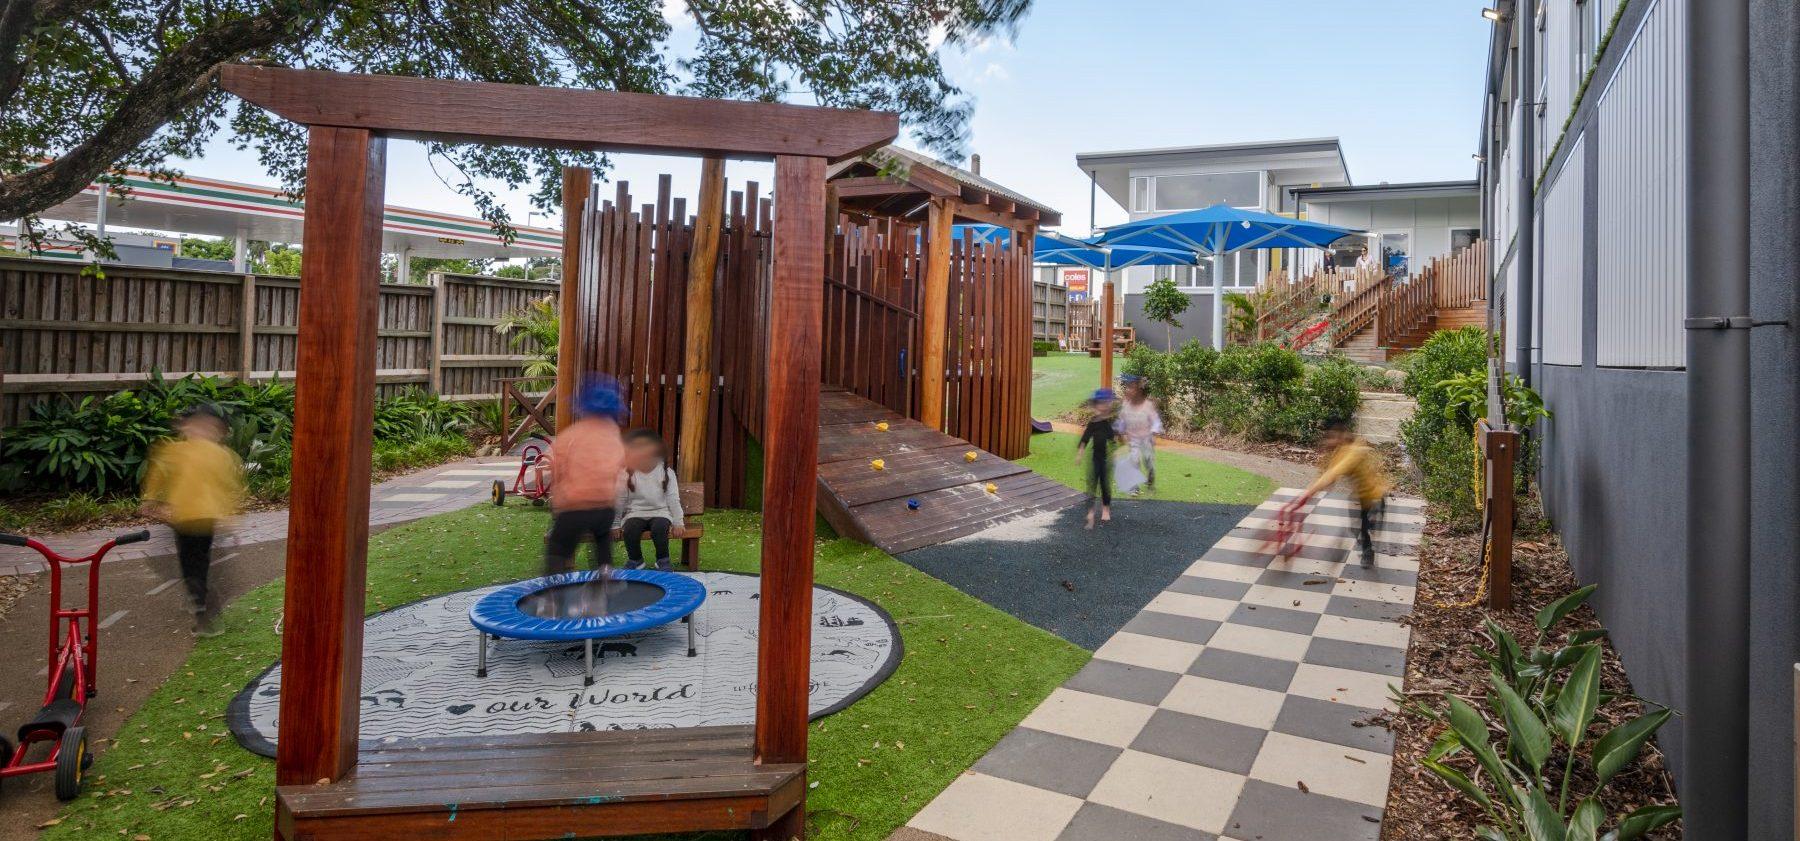 Handford Road Childcare Exterior Playground